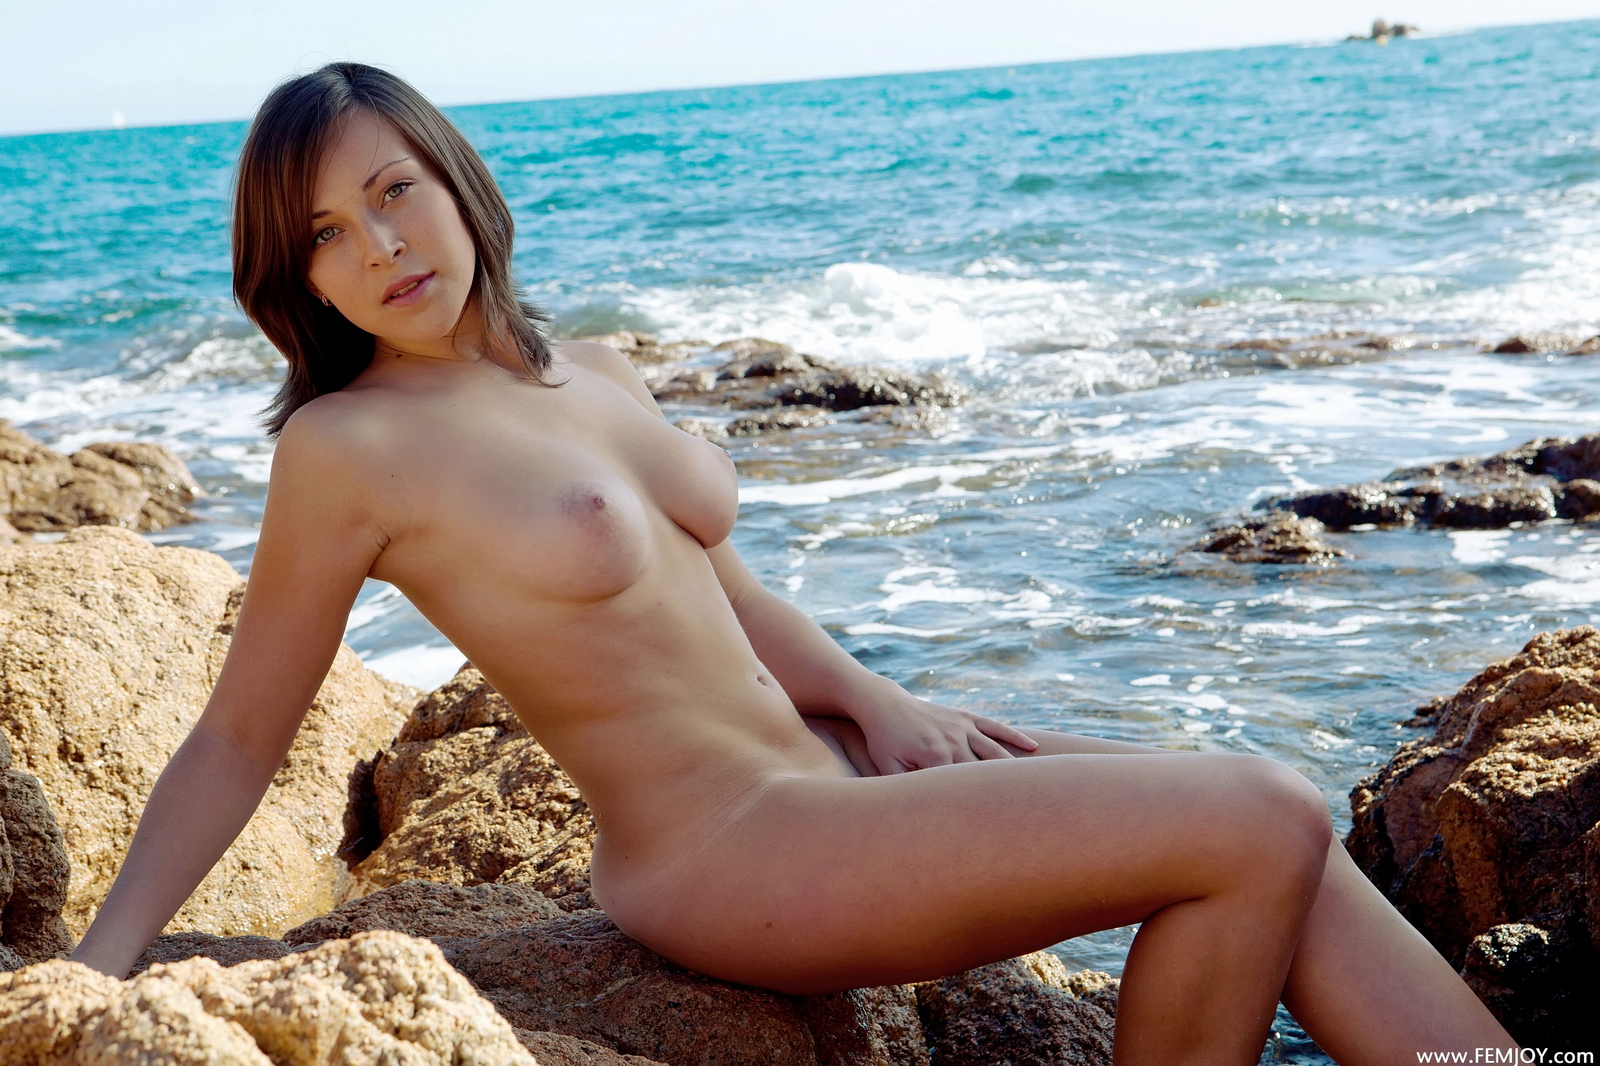 sophia-h-seaside-naked-boobs-rocks-femjoy-35